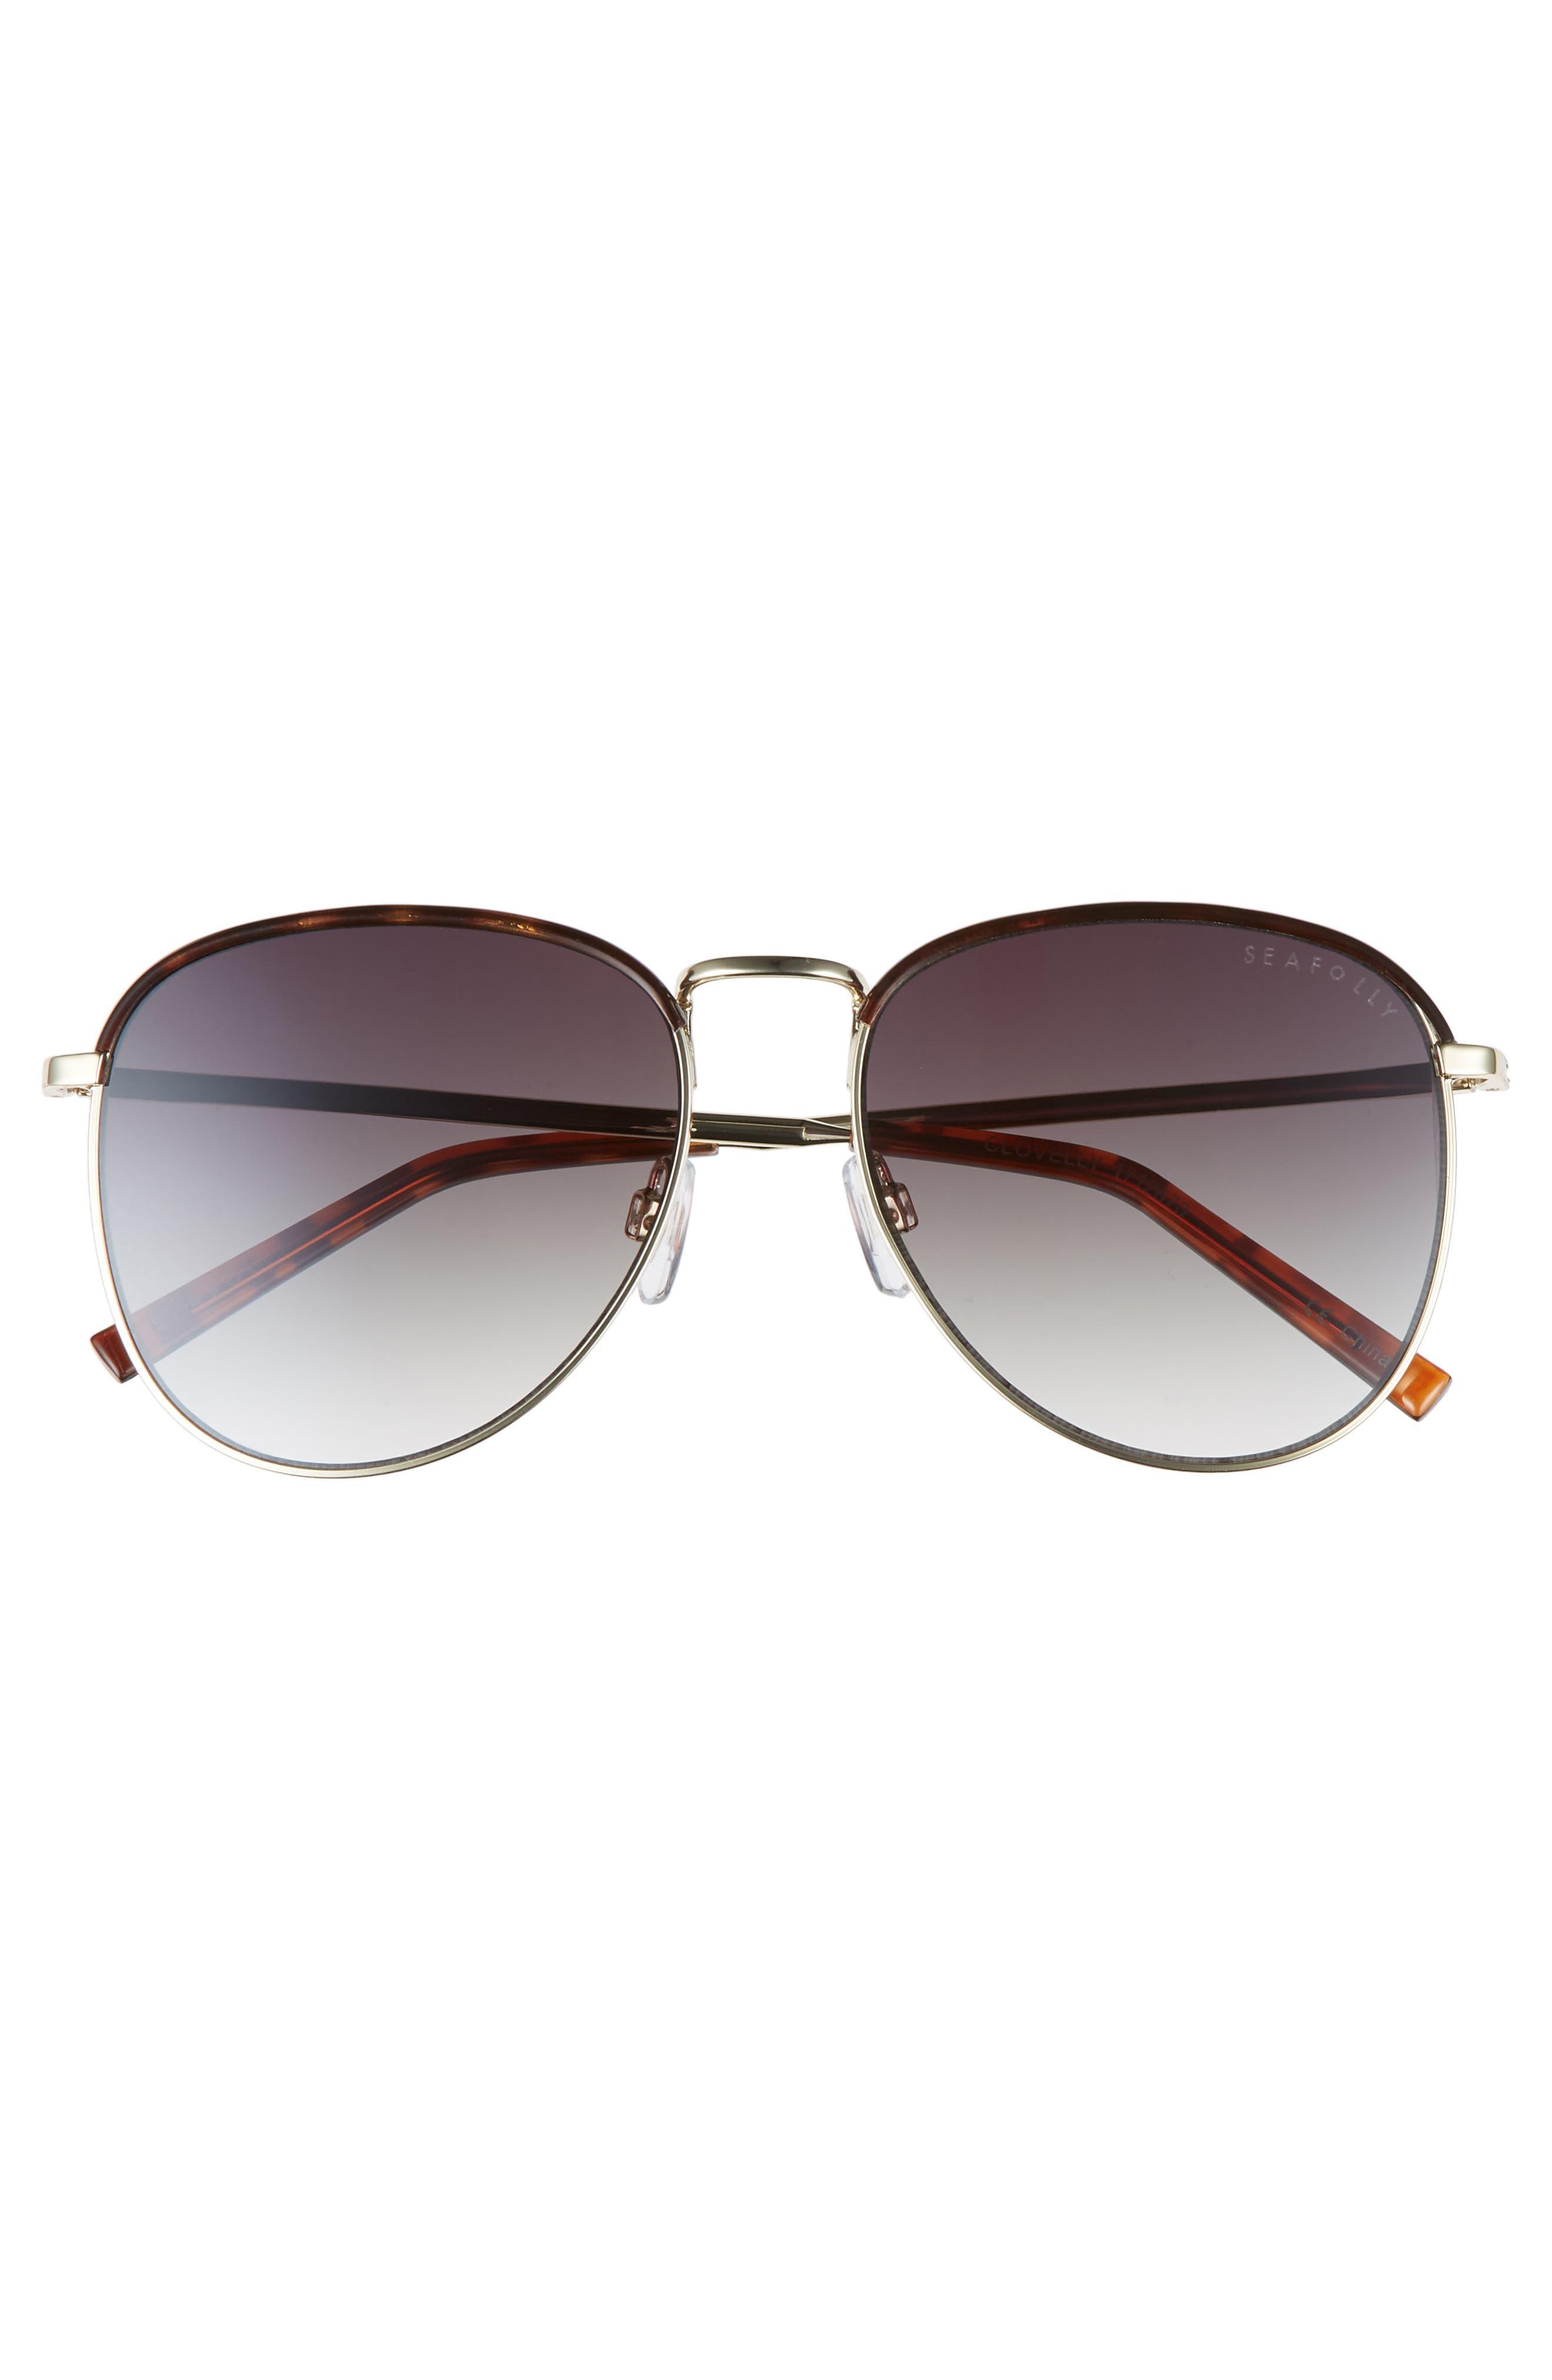 Clovelly 56mm Metal Sunglasses,                             Alternate thumbnail 3, color,                             DARK TORT